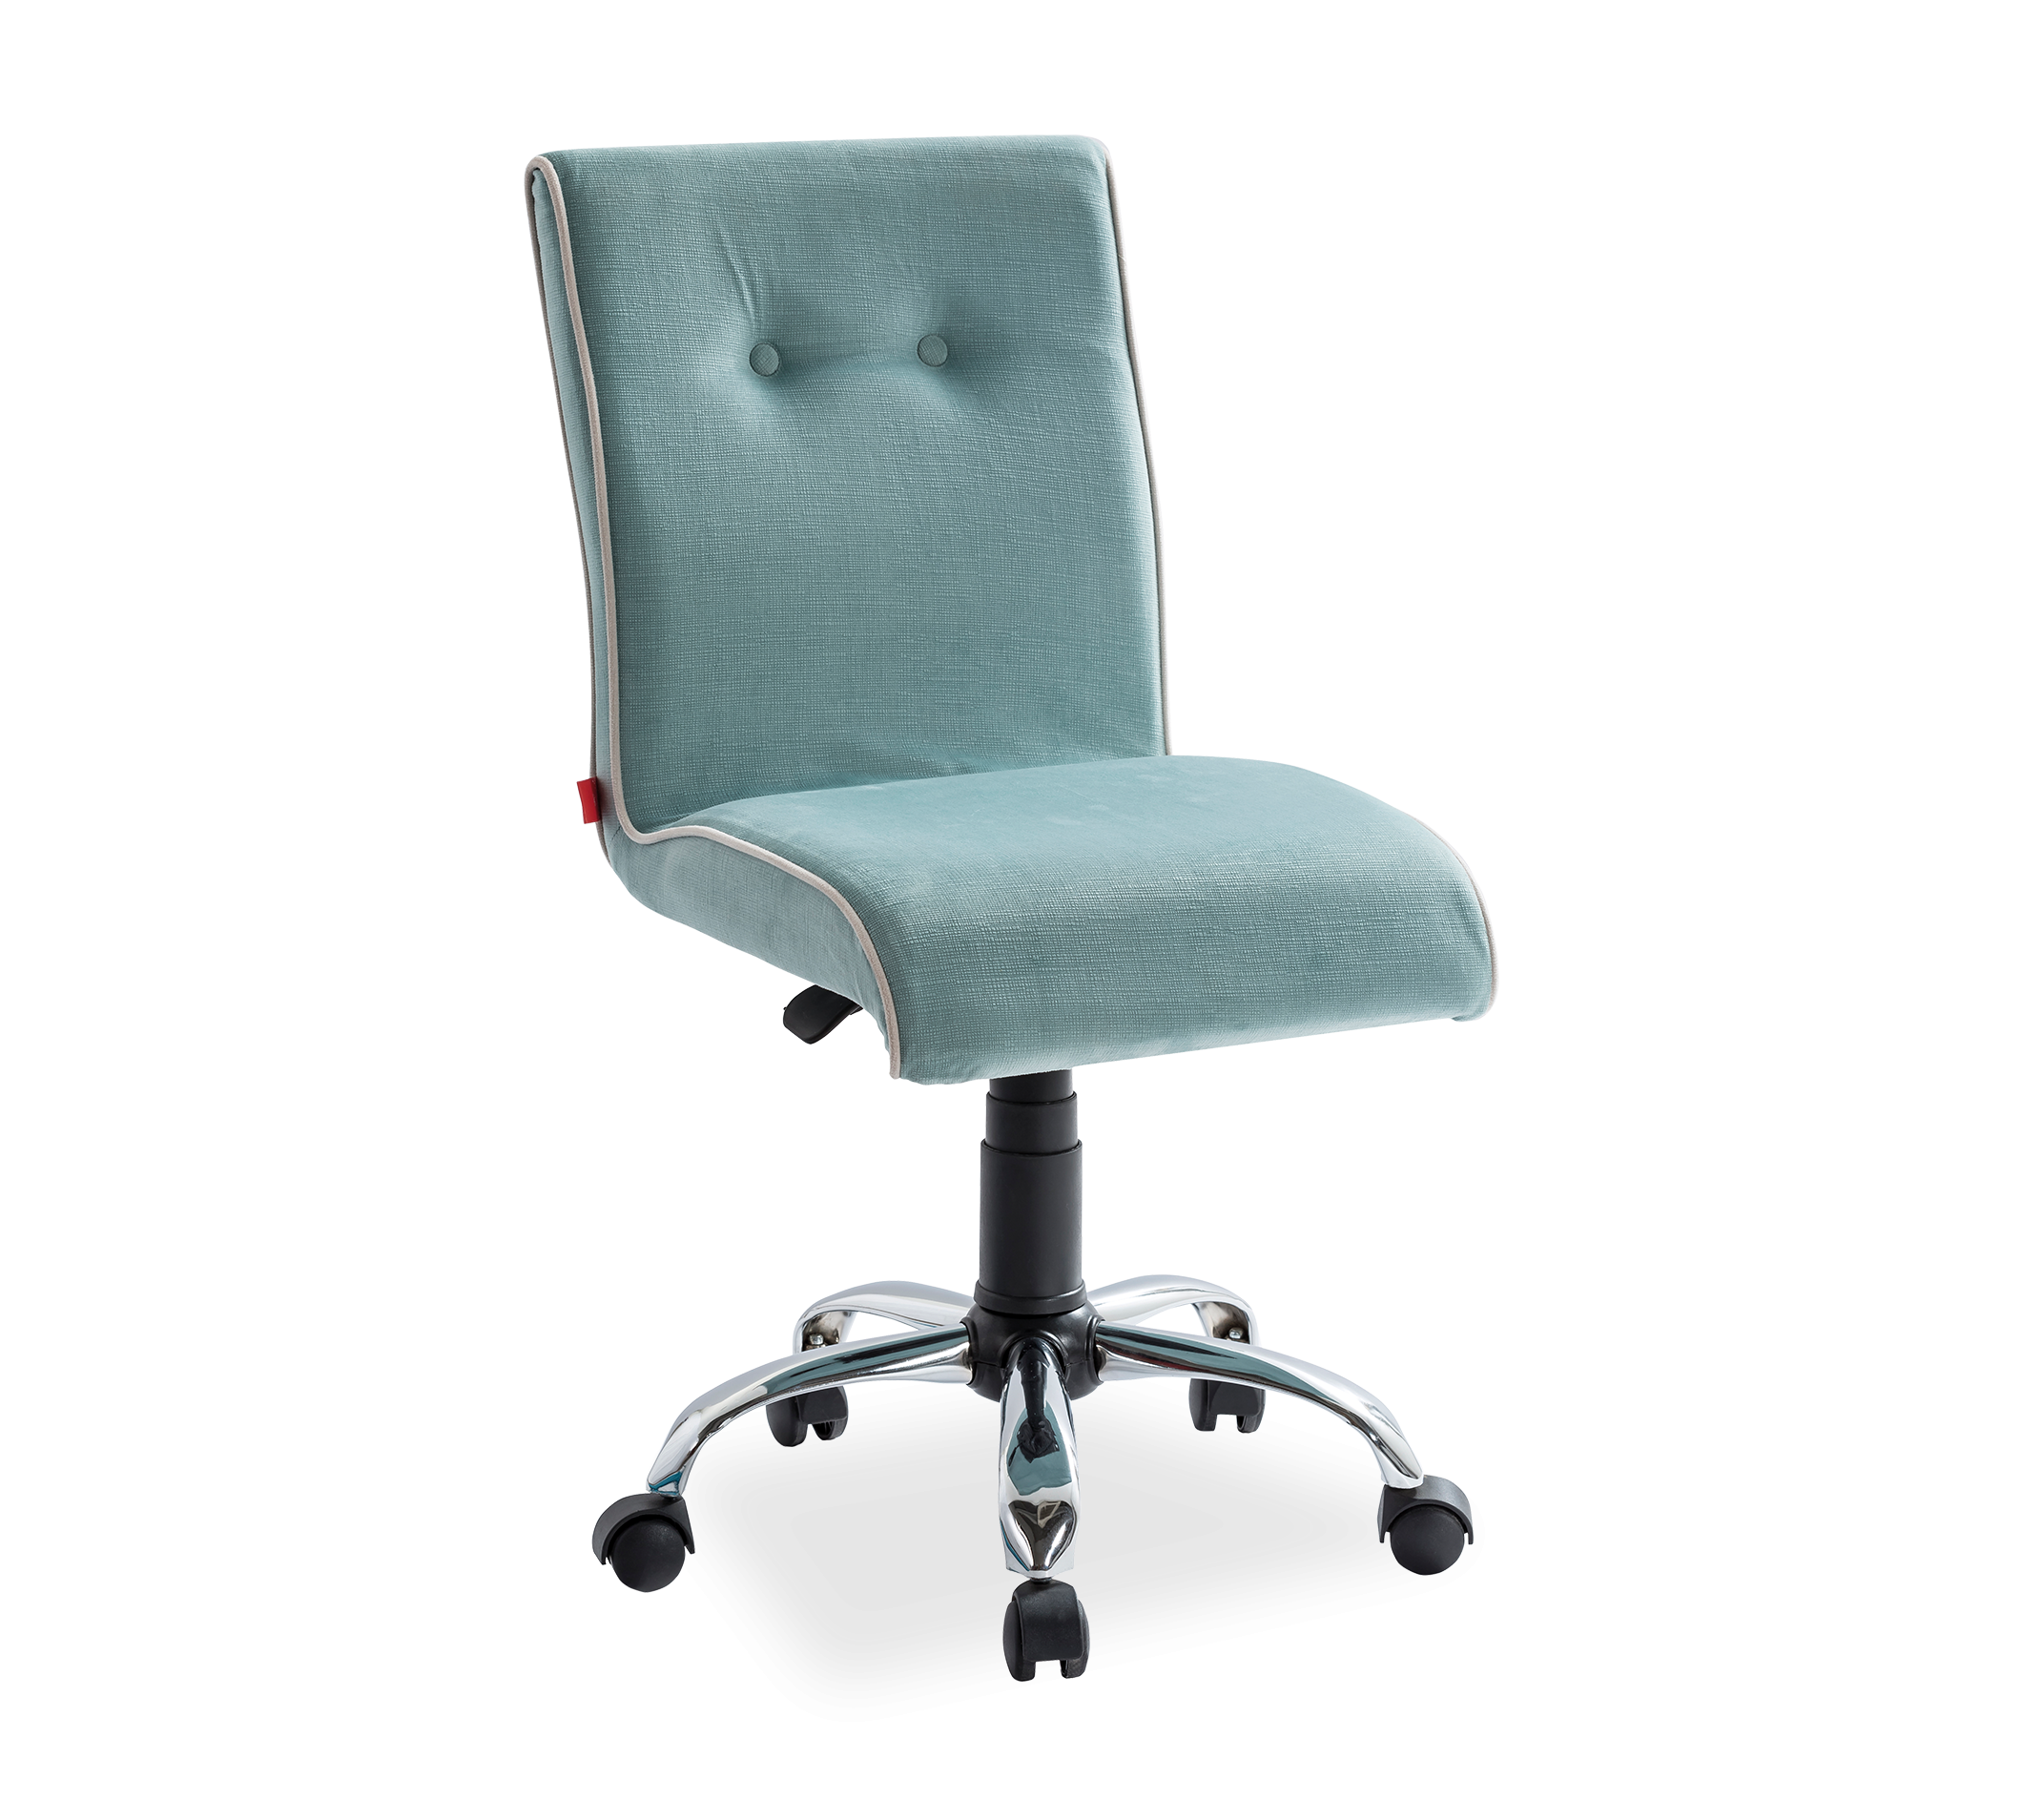 Scaun de birou pentru copii, tapitat cu stofa Summer Mint, l56xA60xH86-96 cm imagine